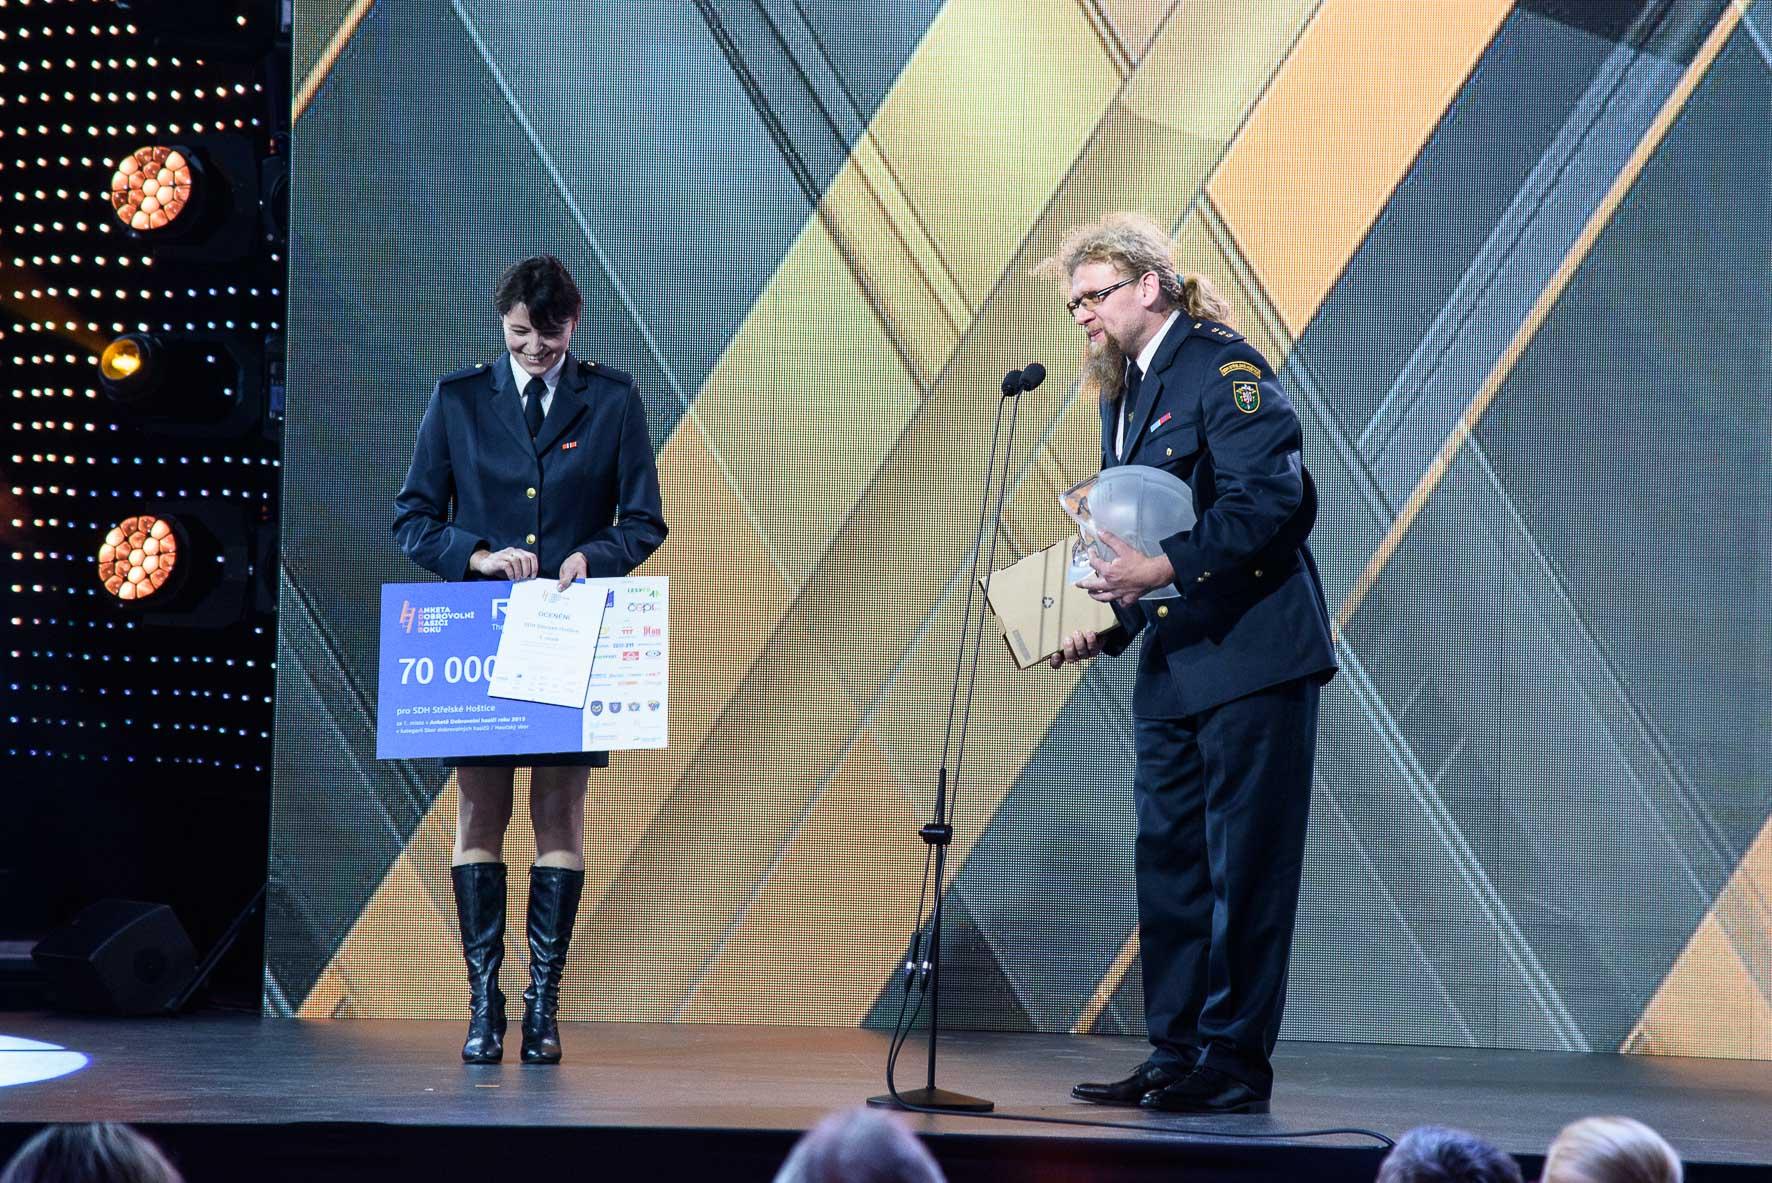 anketa-dobrovolni-hasici-roku-2015-vyhlaseni-vysledku-sdh-strelske-hostice